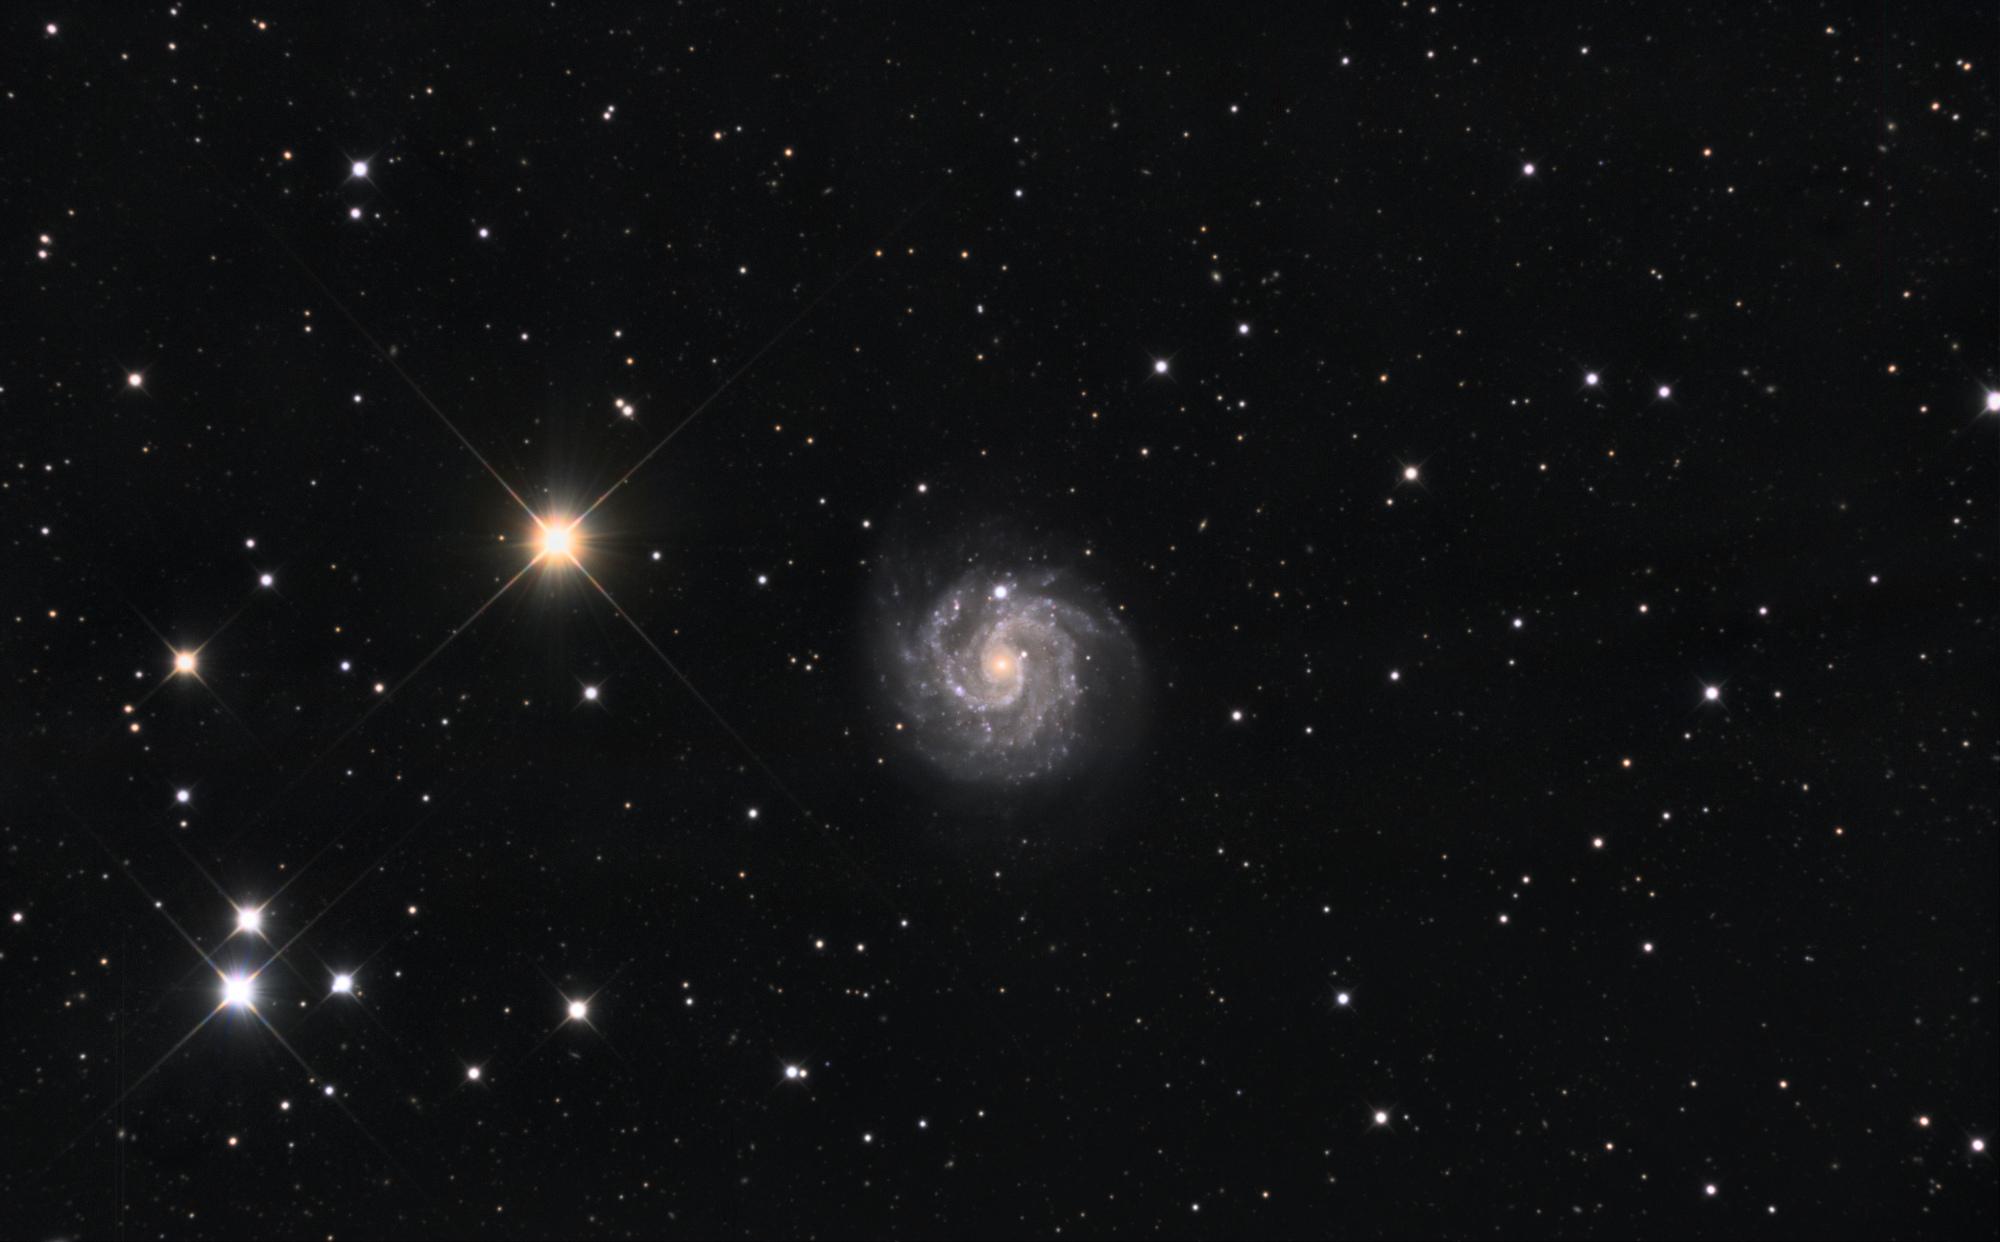 NGC3184LRVB-V2-Final1.thumb.jpg.706834ab4dfd580af690f45c36d657e0.jpg